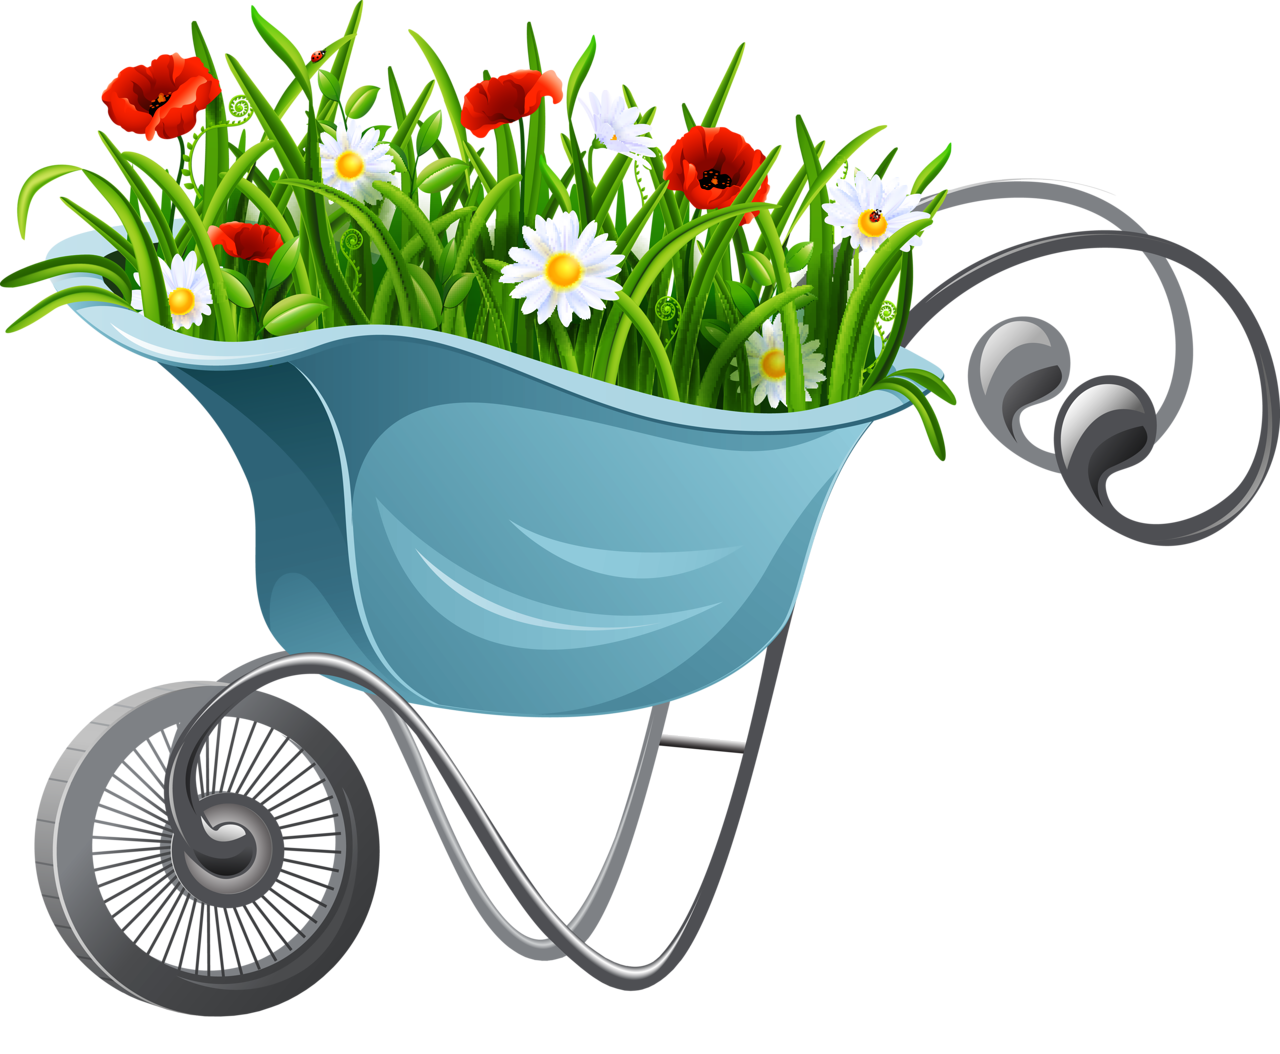 Gardening clipart city. Content png pinterest gardens